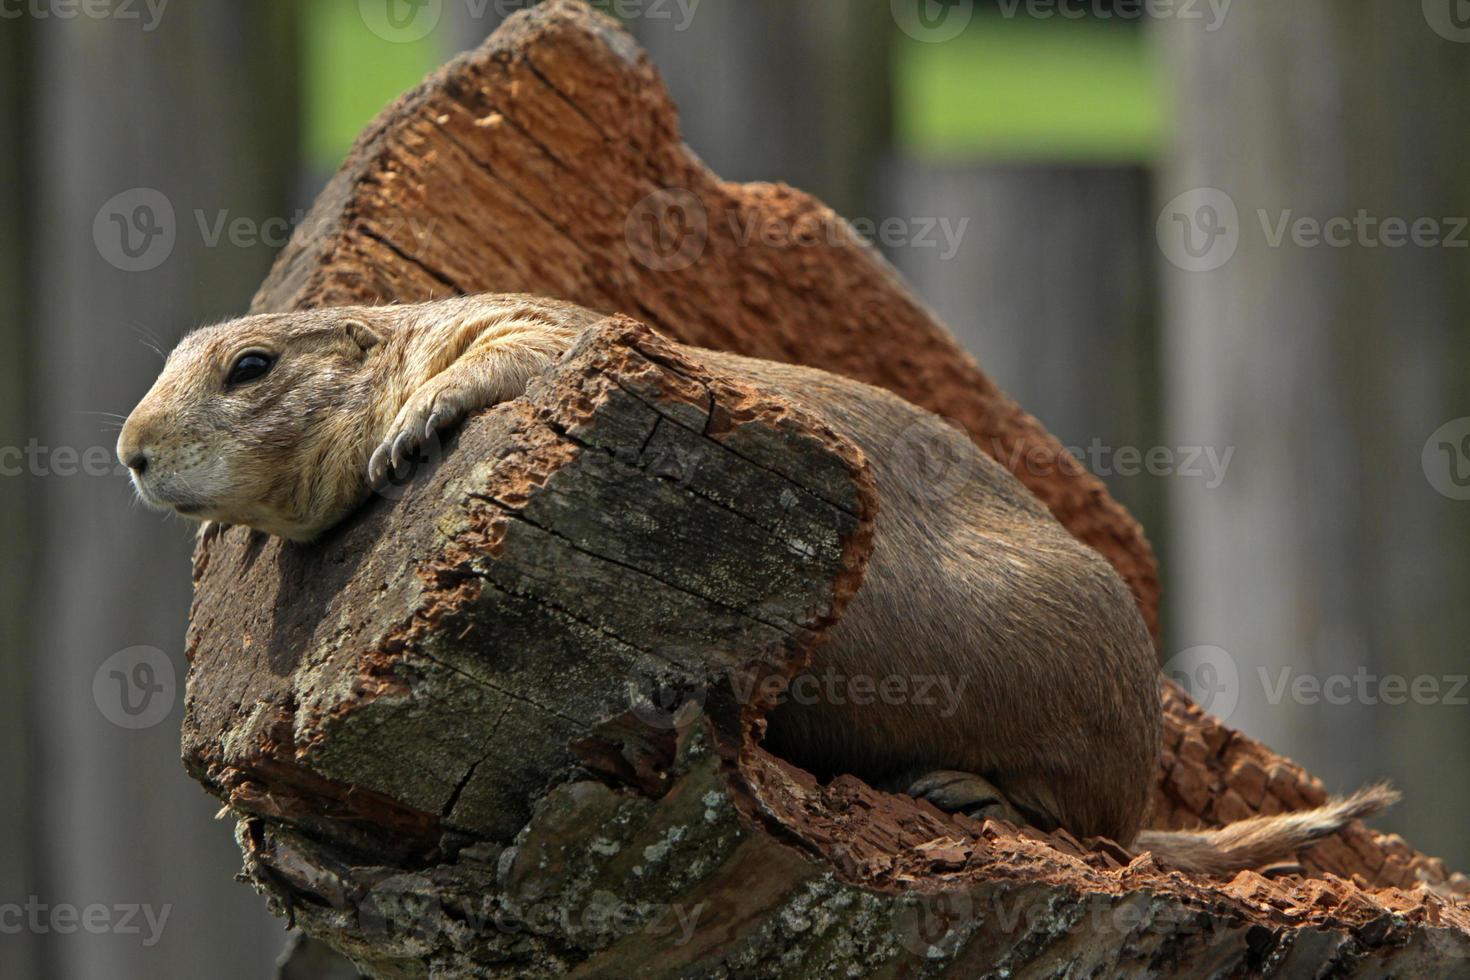 Prairie dog photo